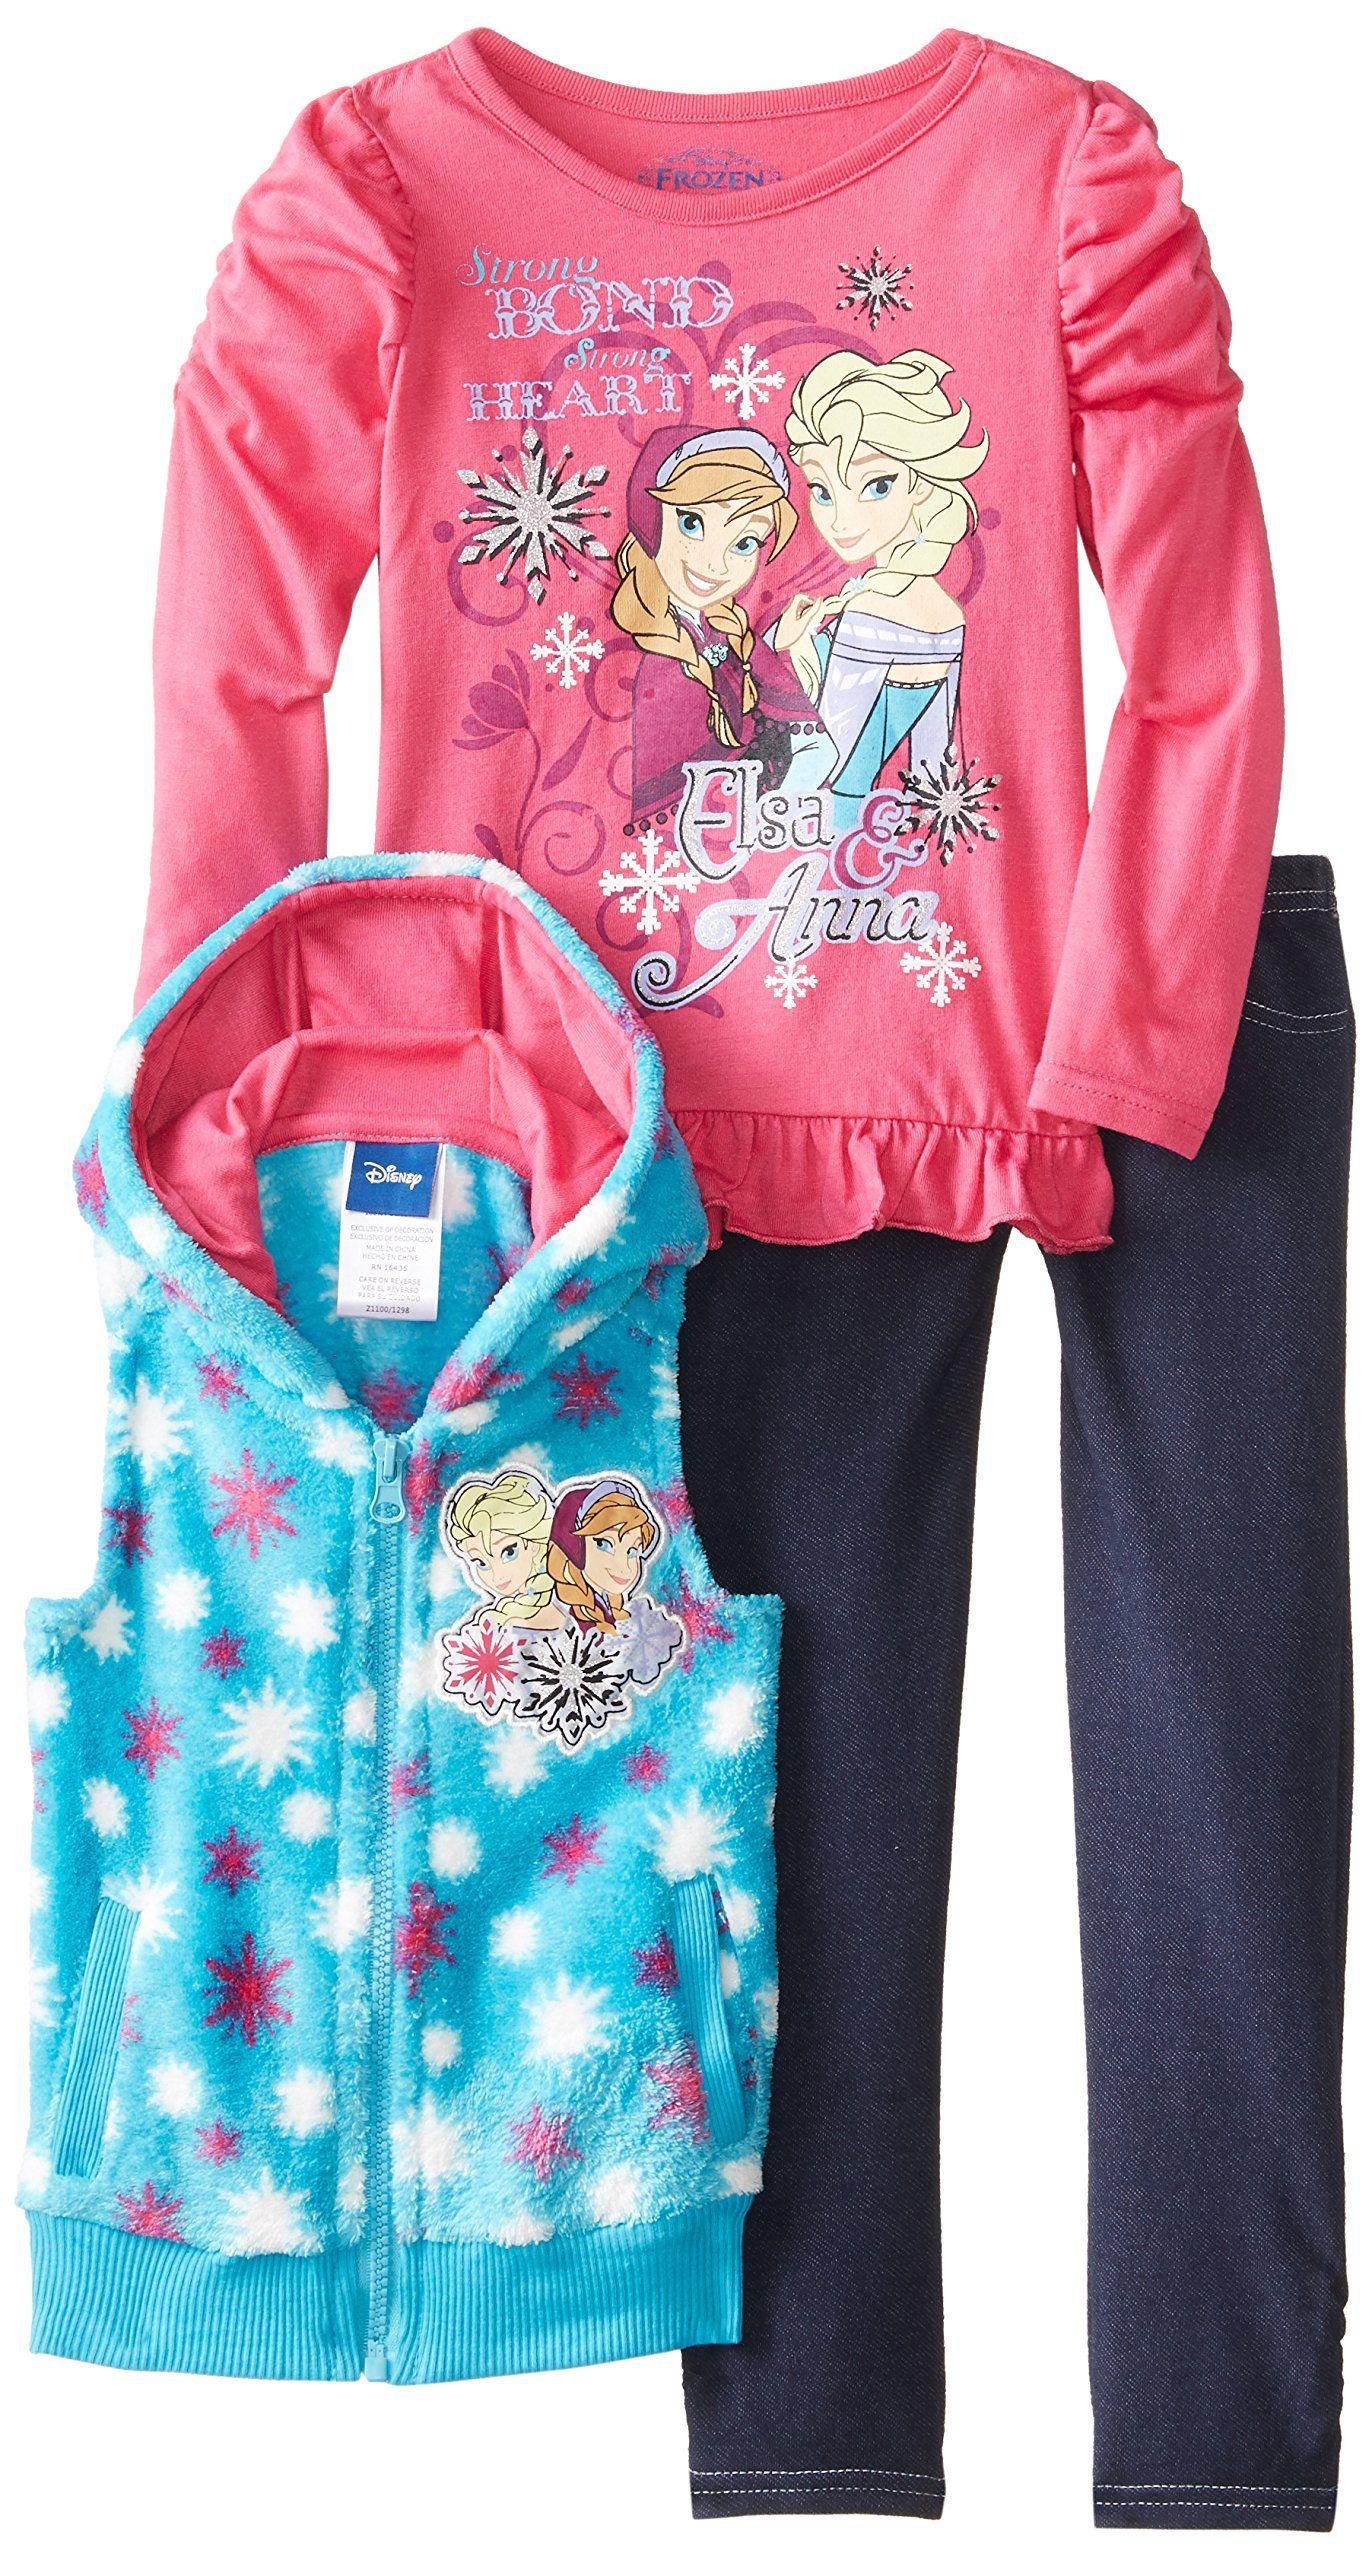 d8493e84d33c3 Disney Little Girls' Anna and Elsa Vest Set, Pink, 2T | Baby and ...